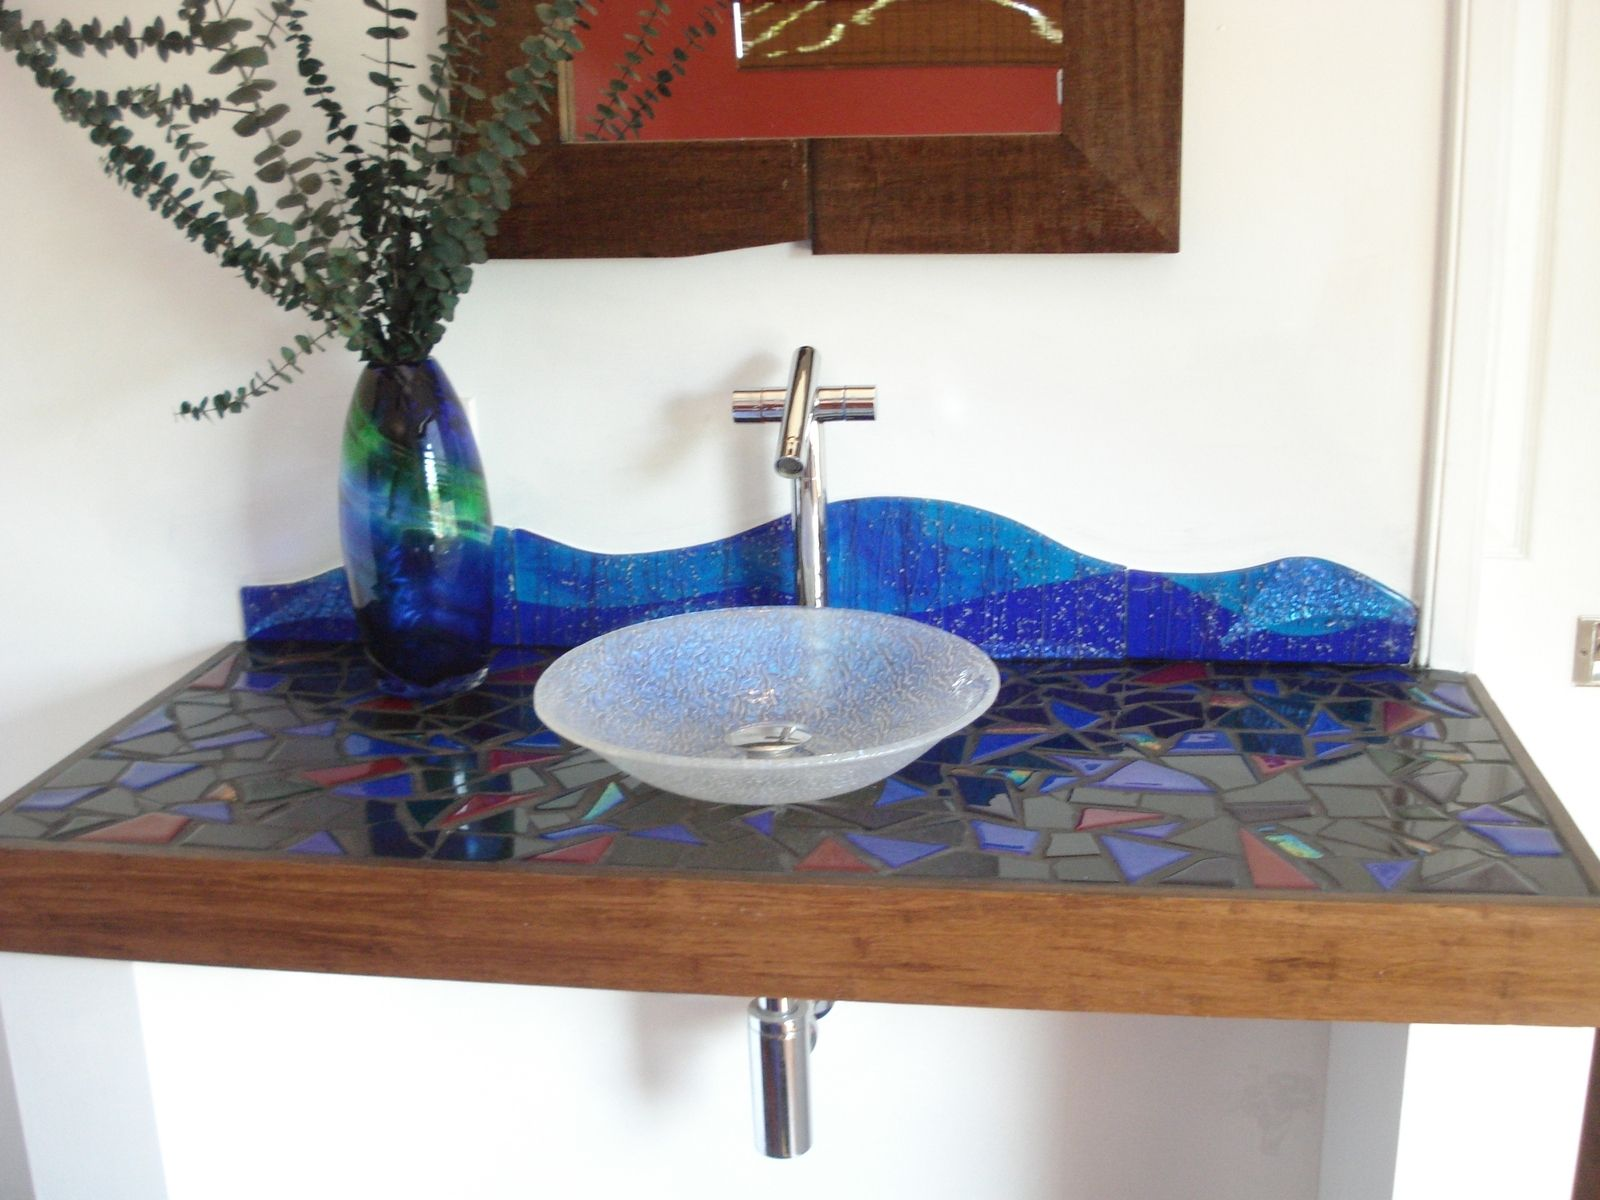 Hand Made Custom Dichroic Glass Sink by Rjk Studio | CustomMade.com